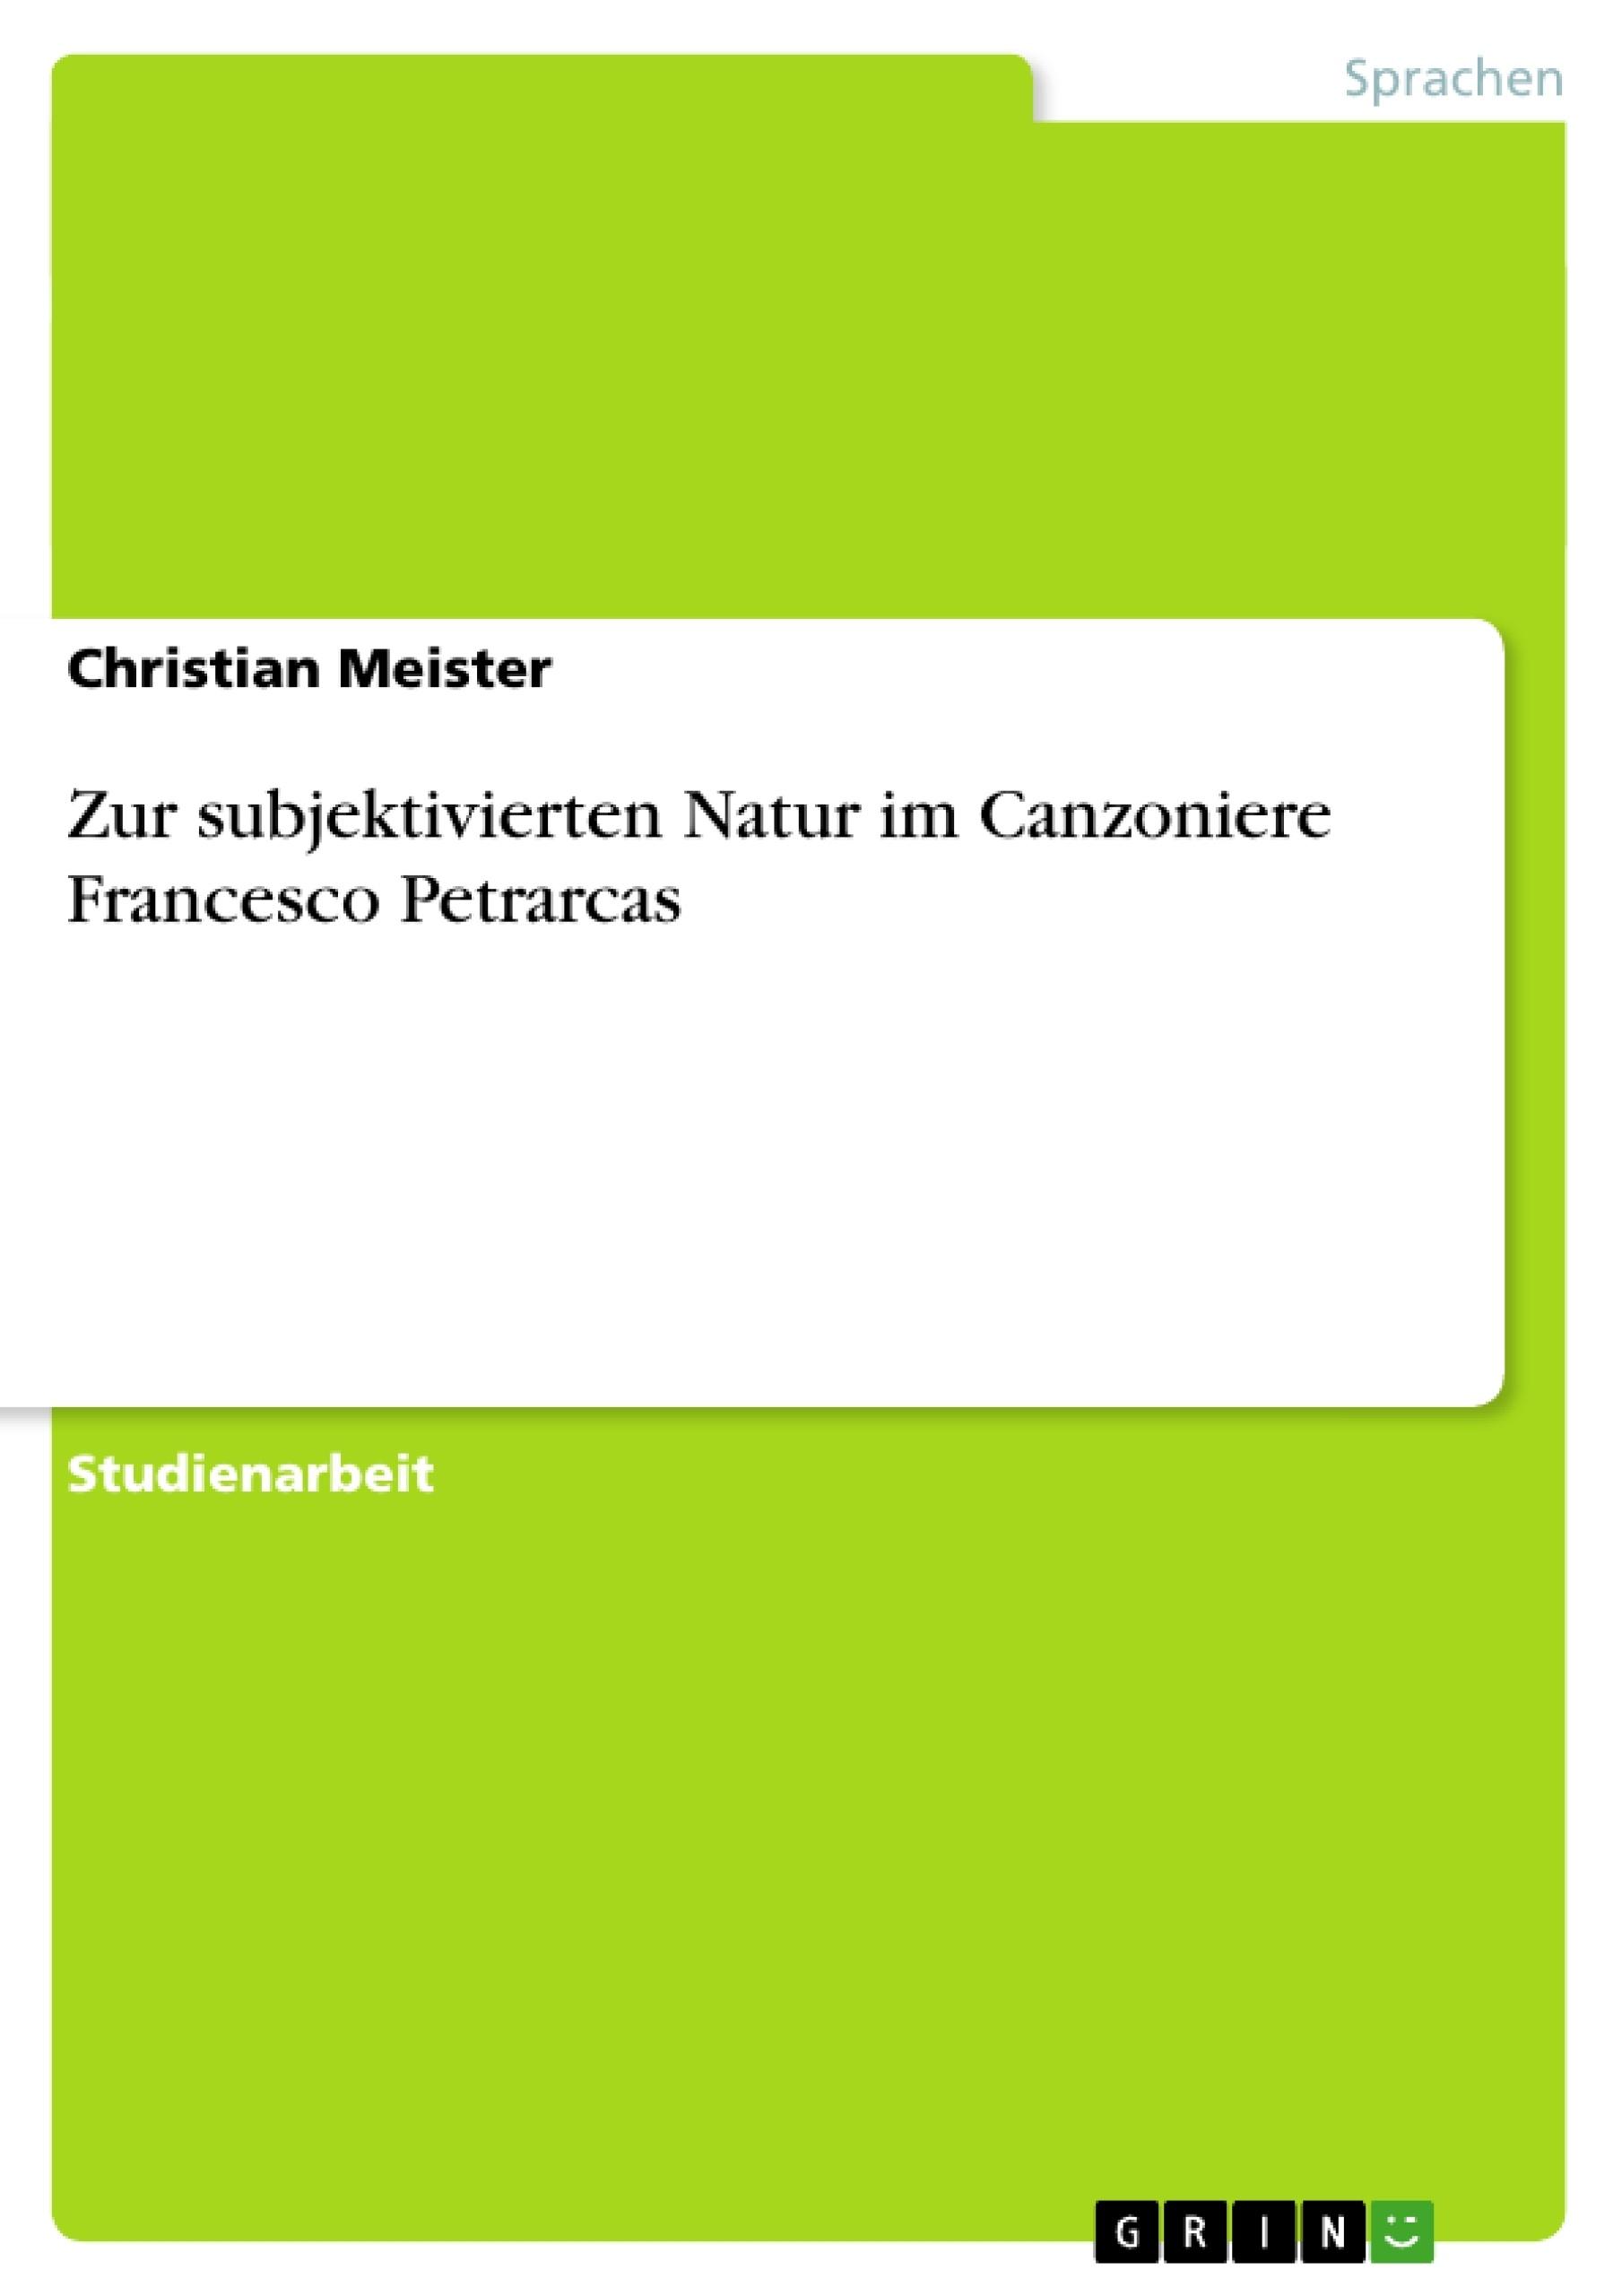 Titel: Zur subjektivierten Natur im Canzoniere Francesco Petrarcas